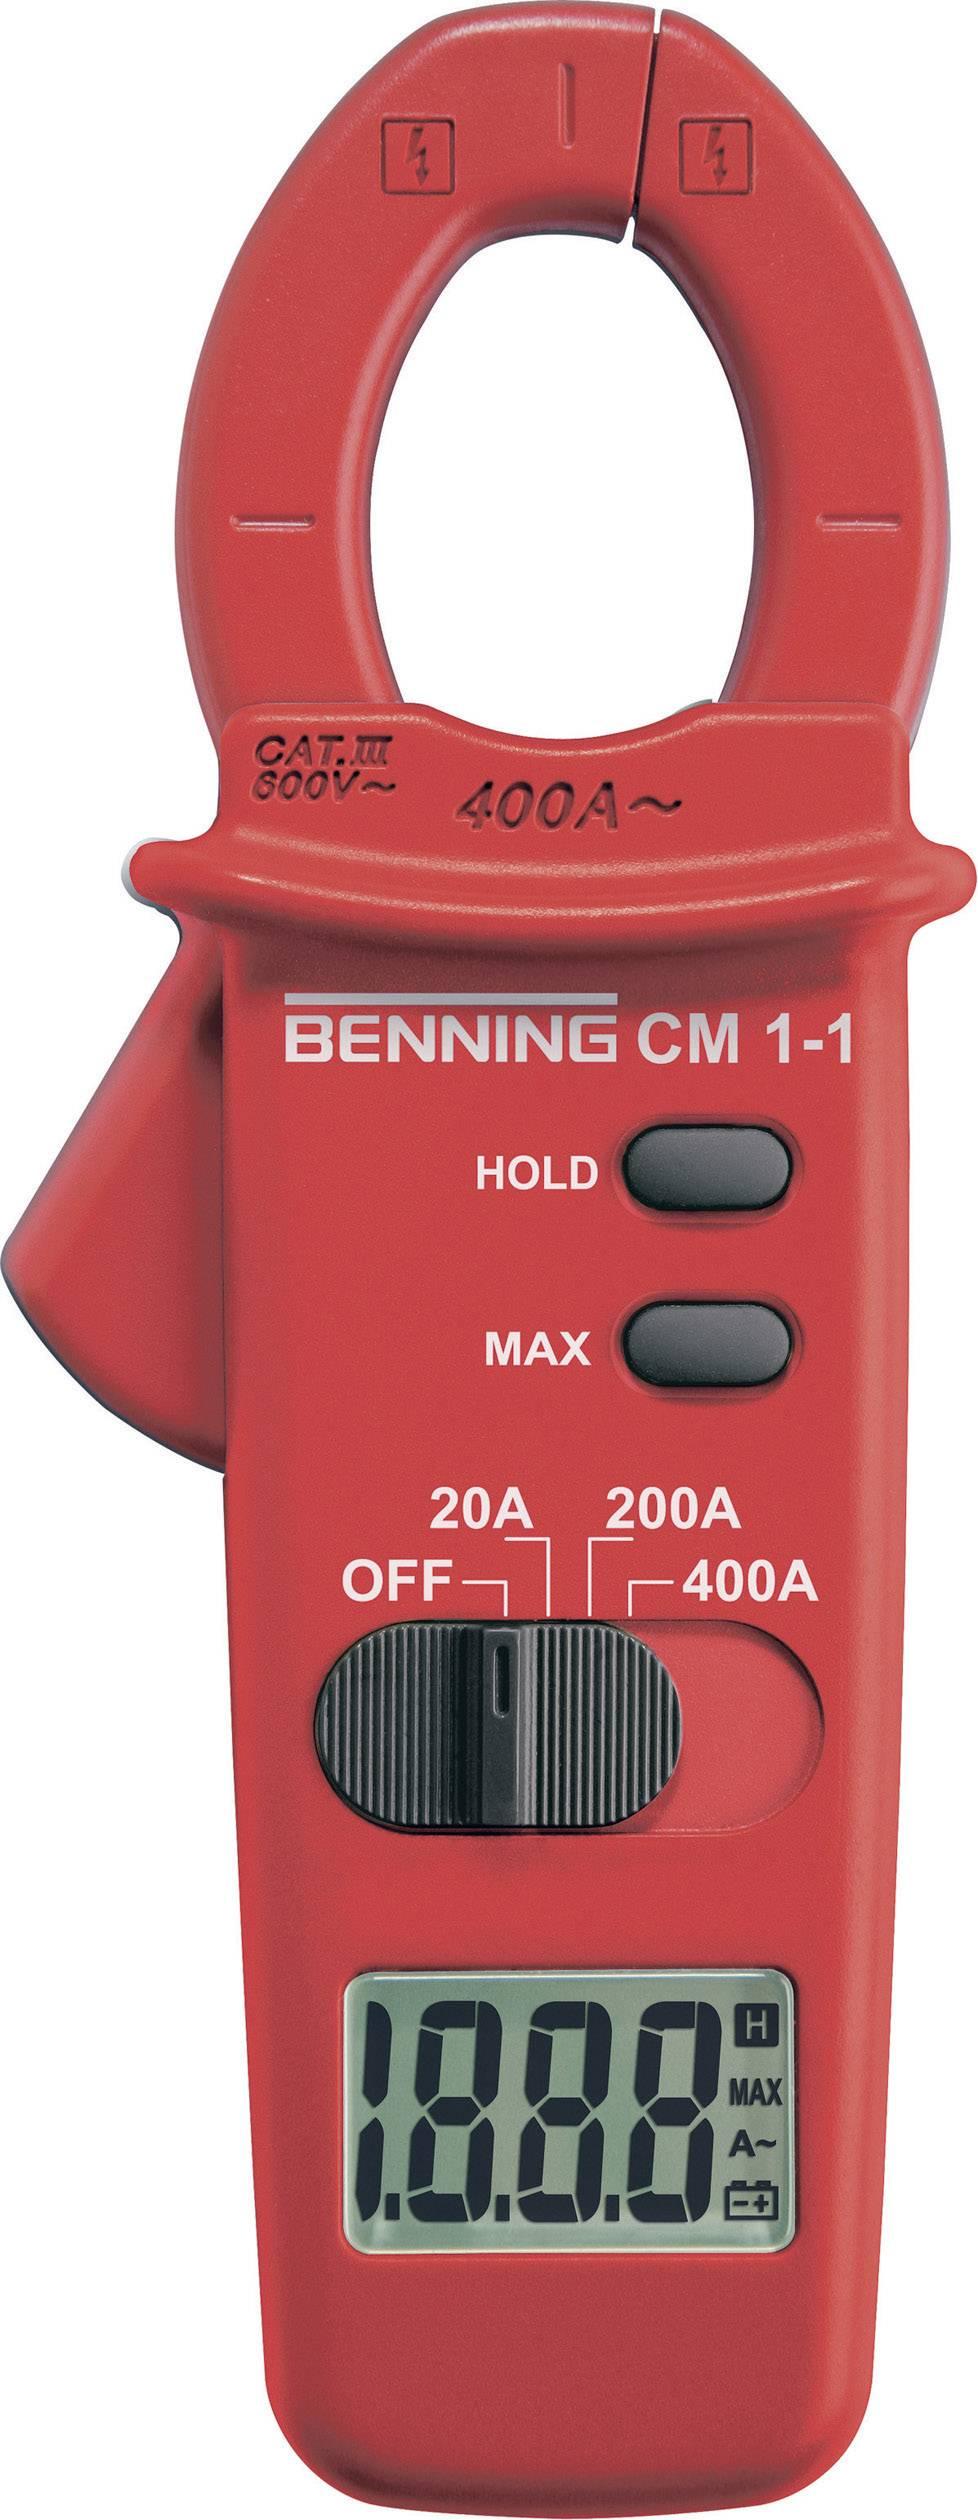 Klešťový ampérmetr Benning CM 1-1, CAT III 600 V, 400 A